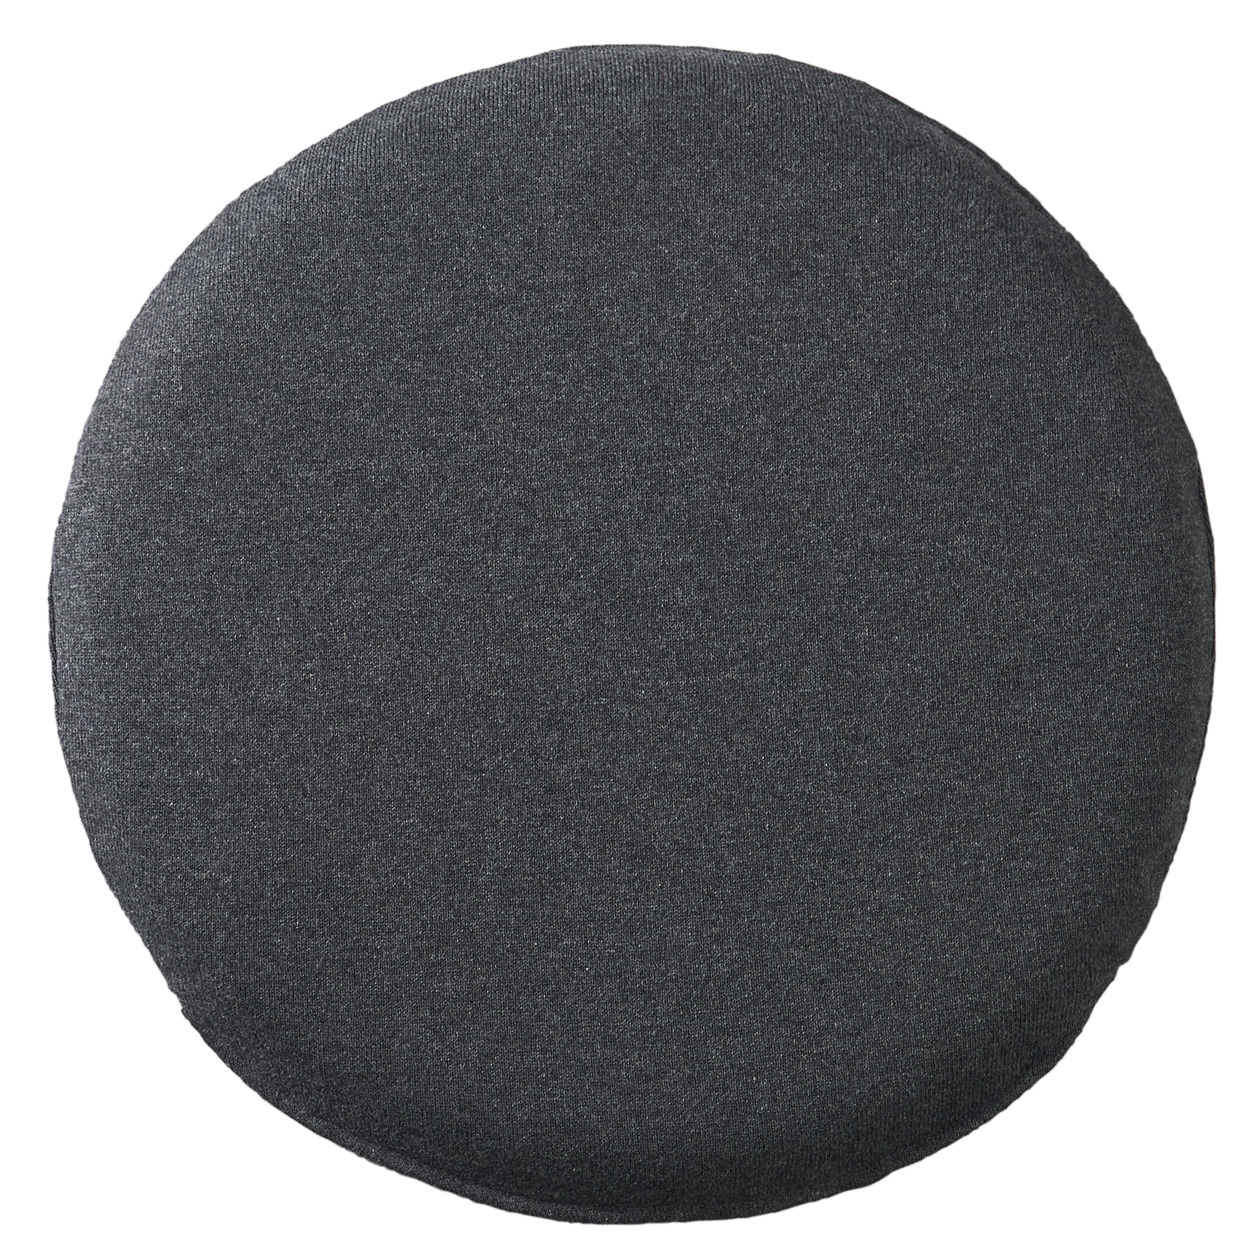 RoomClip商品情報 - ウレタンフォームシートクッション丸型/杢チャコール 杢チャコール